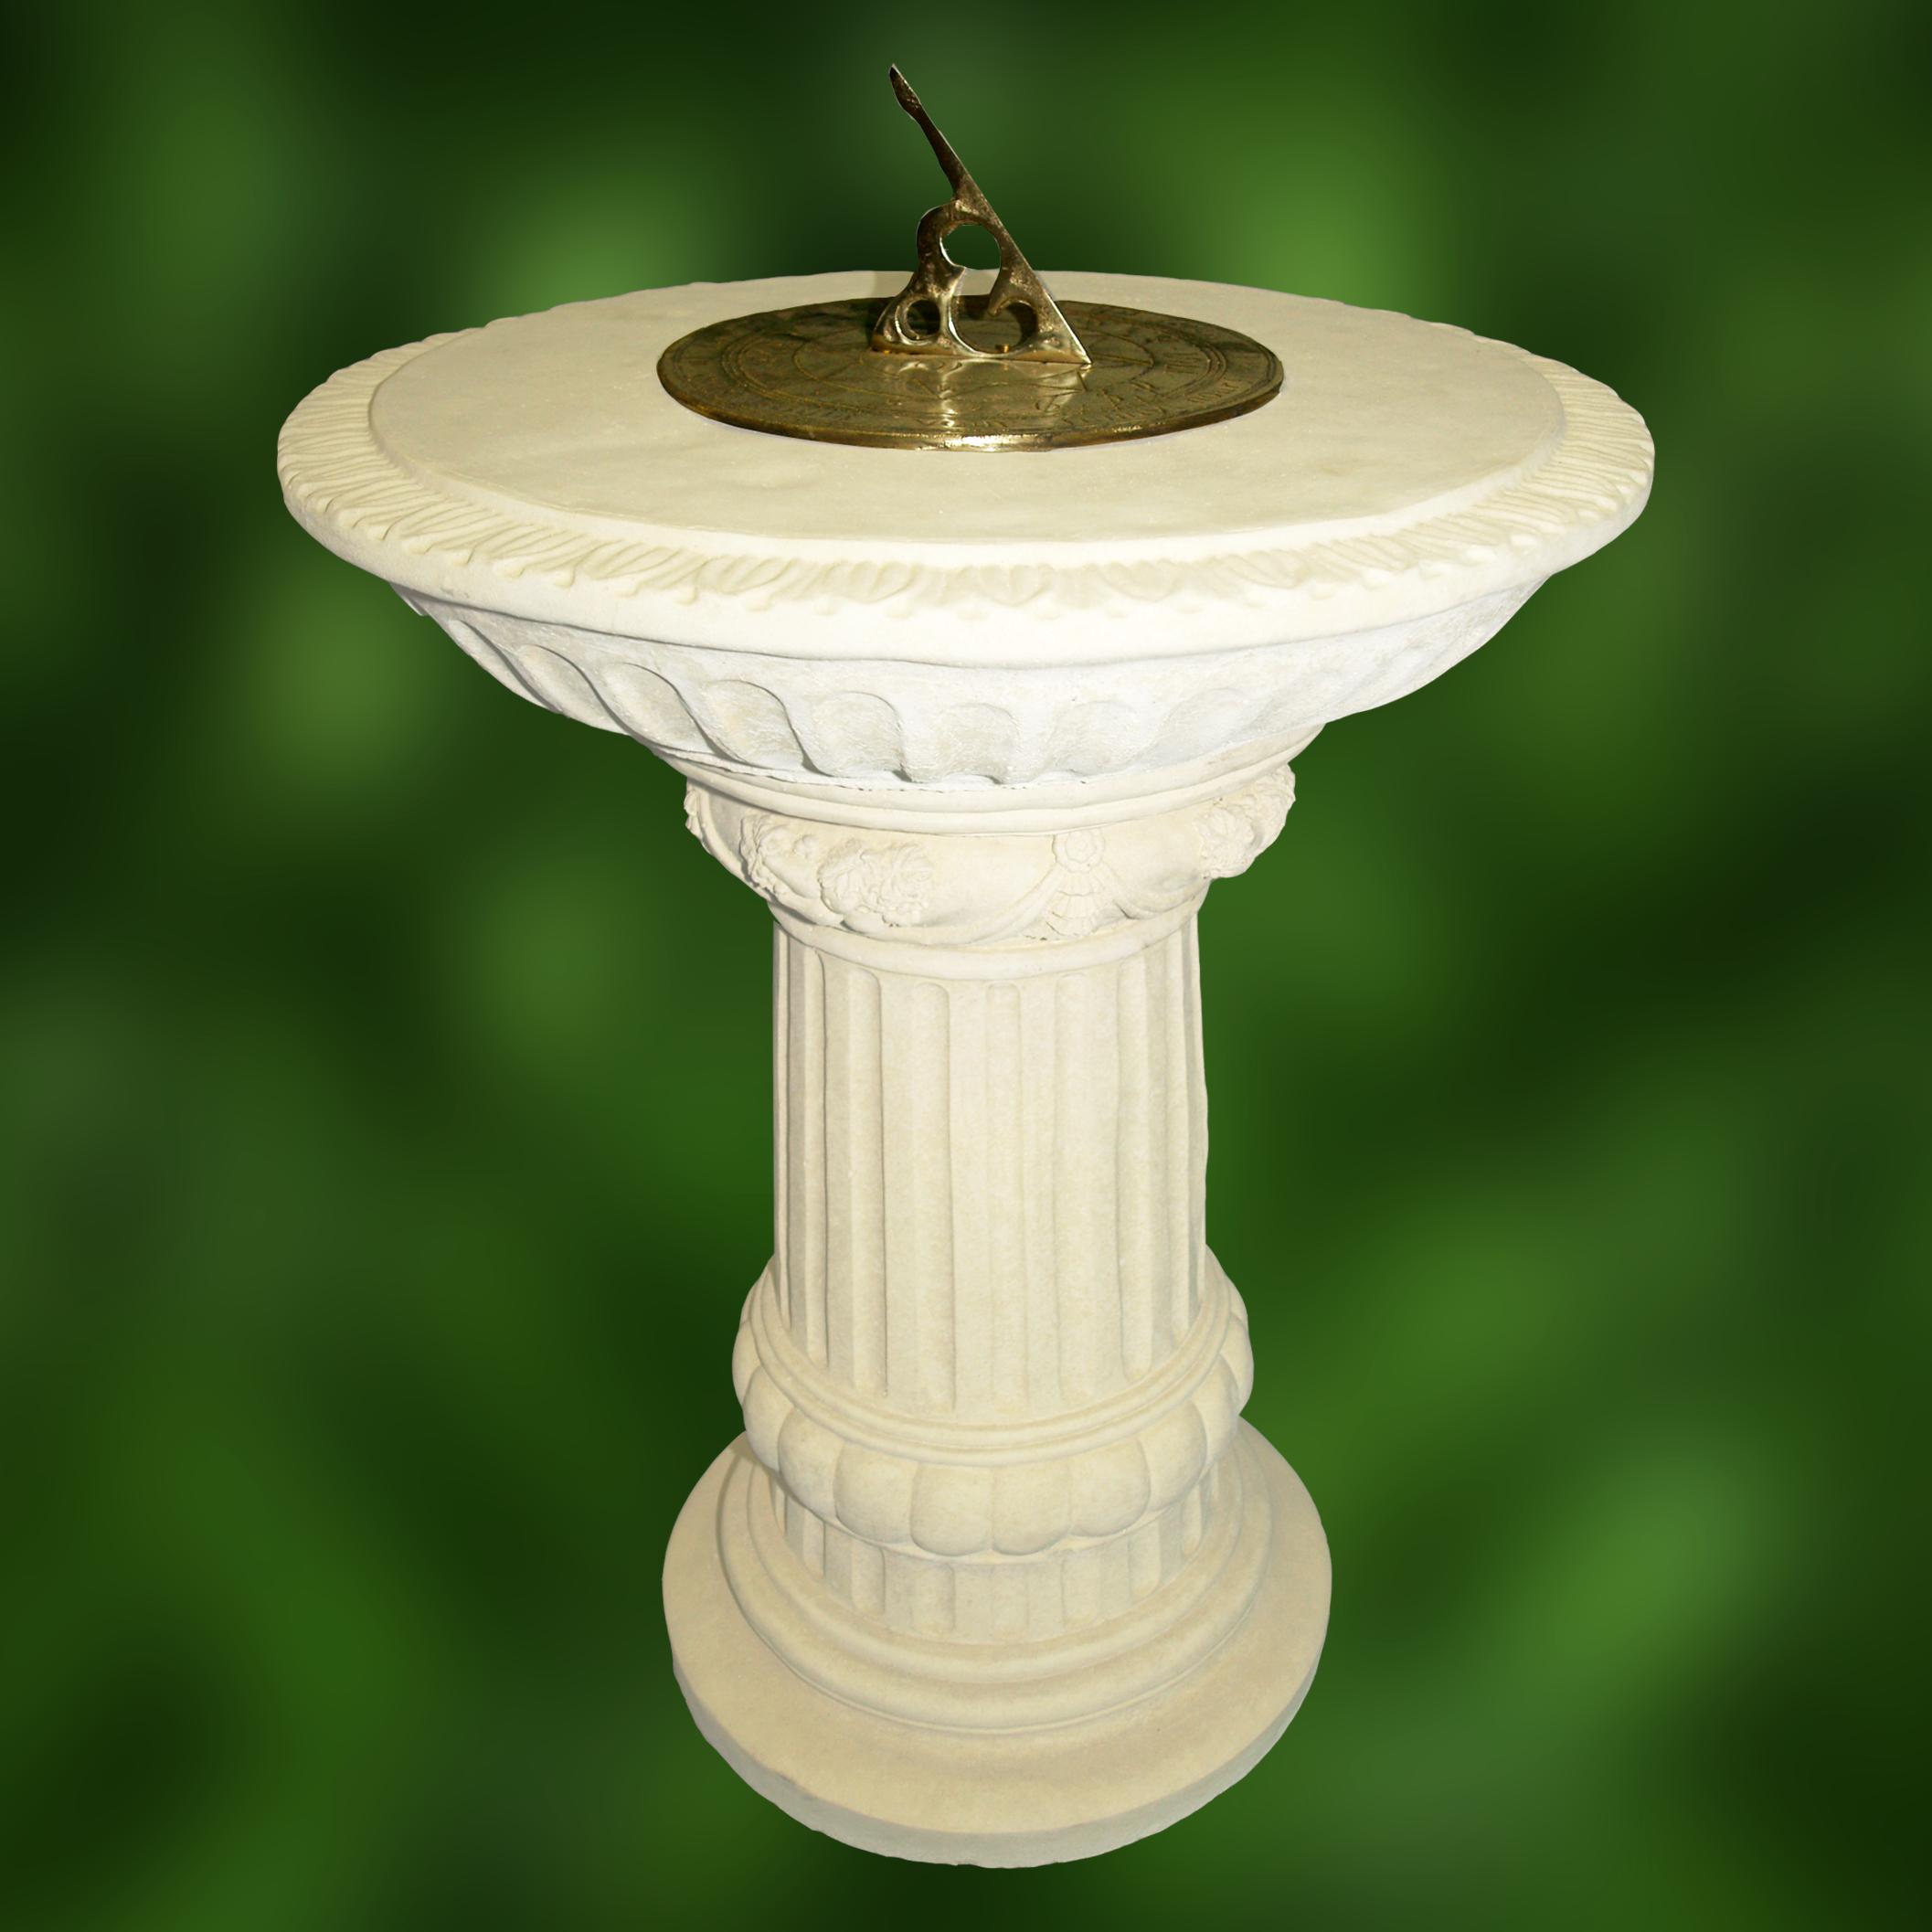 shenandoah with pedestal concrete aluminum sundial